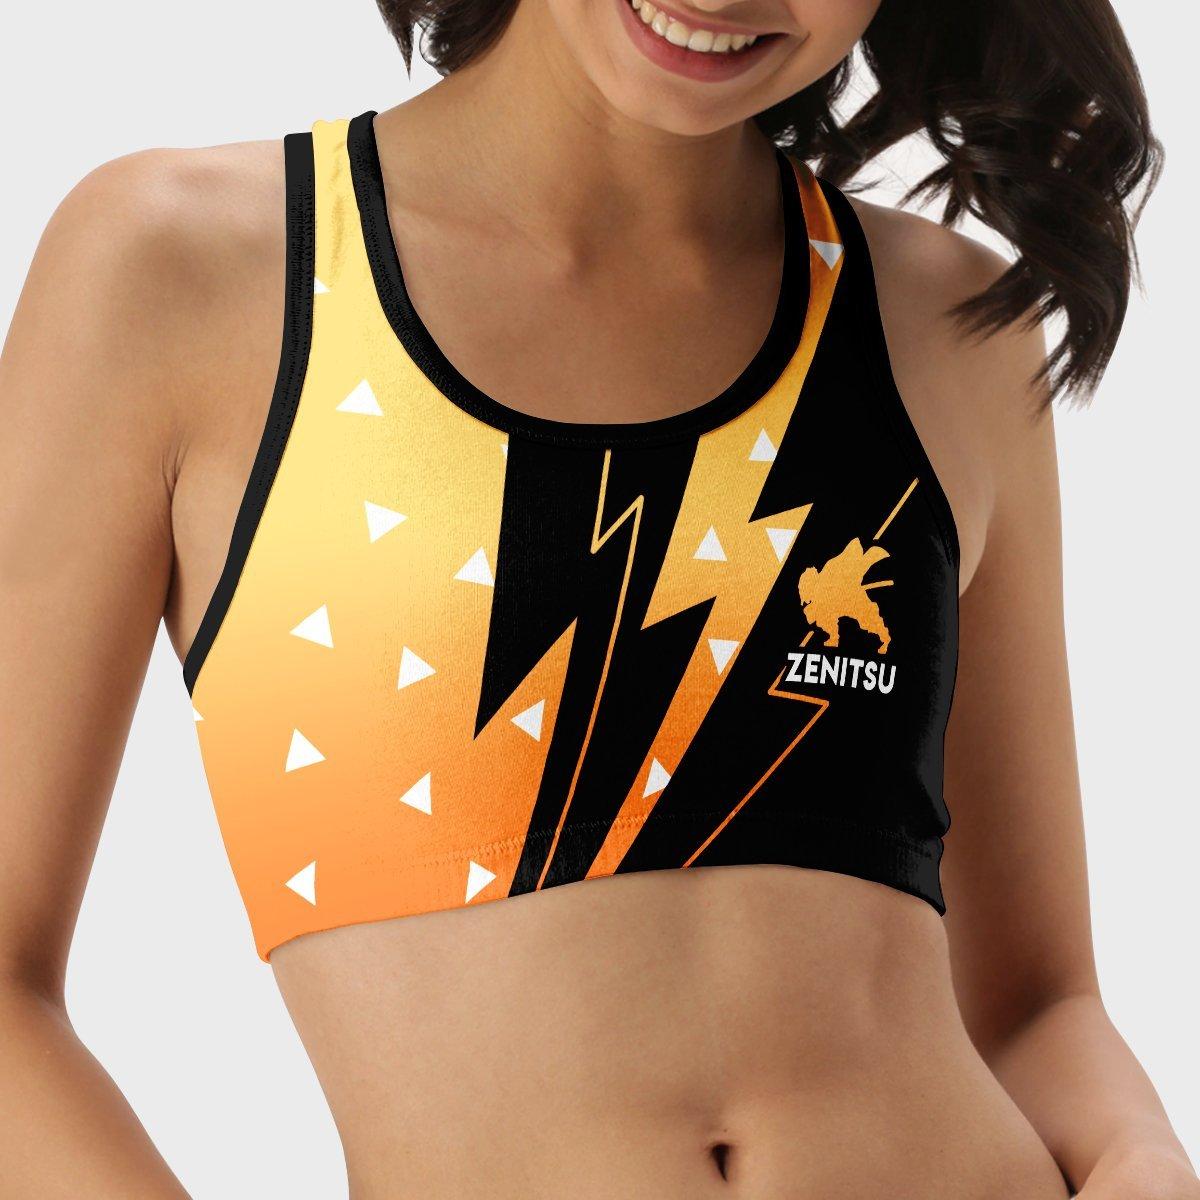 summer zenitsu active wear set 226514 - Anime Swimsuits